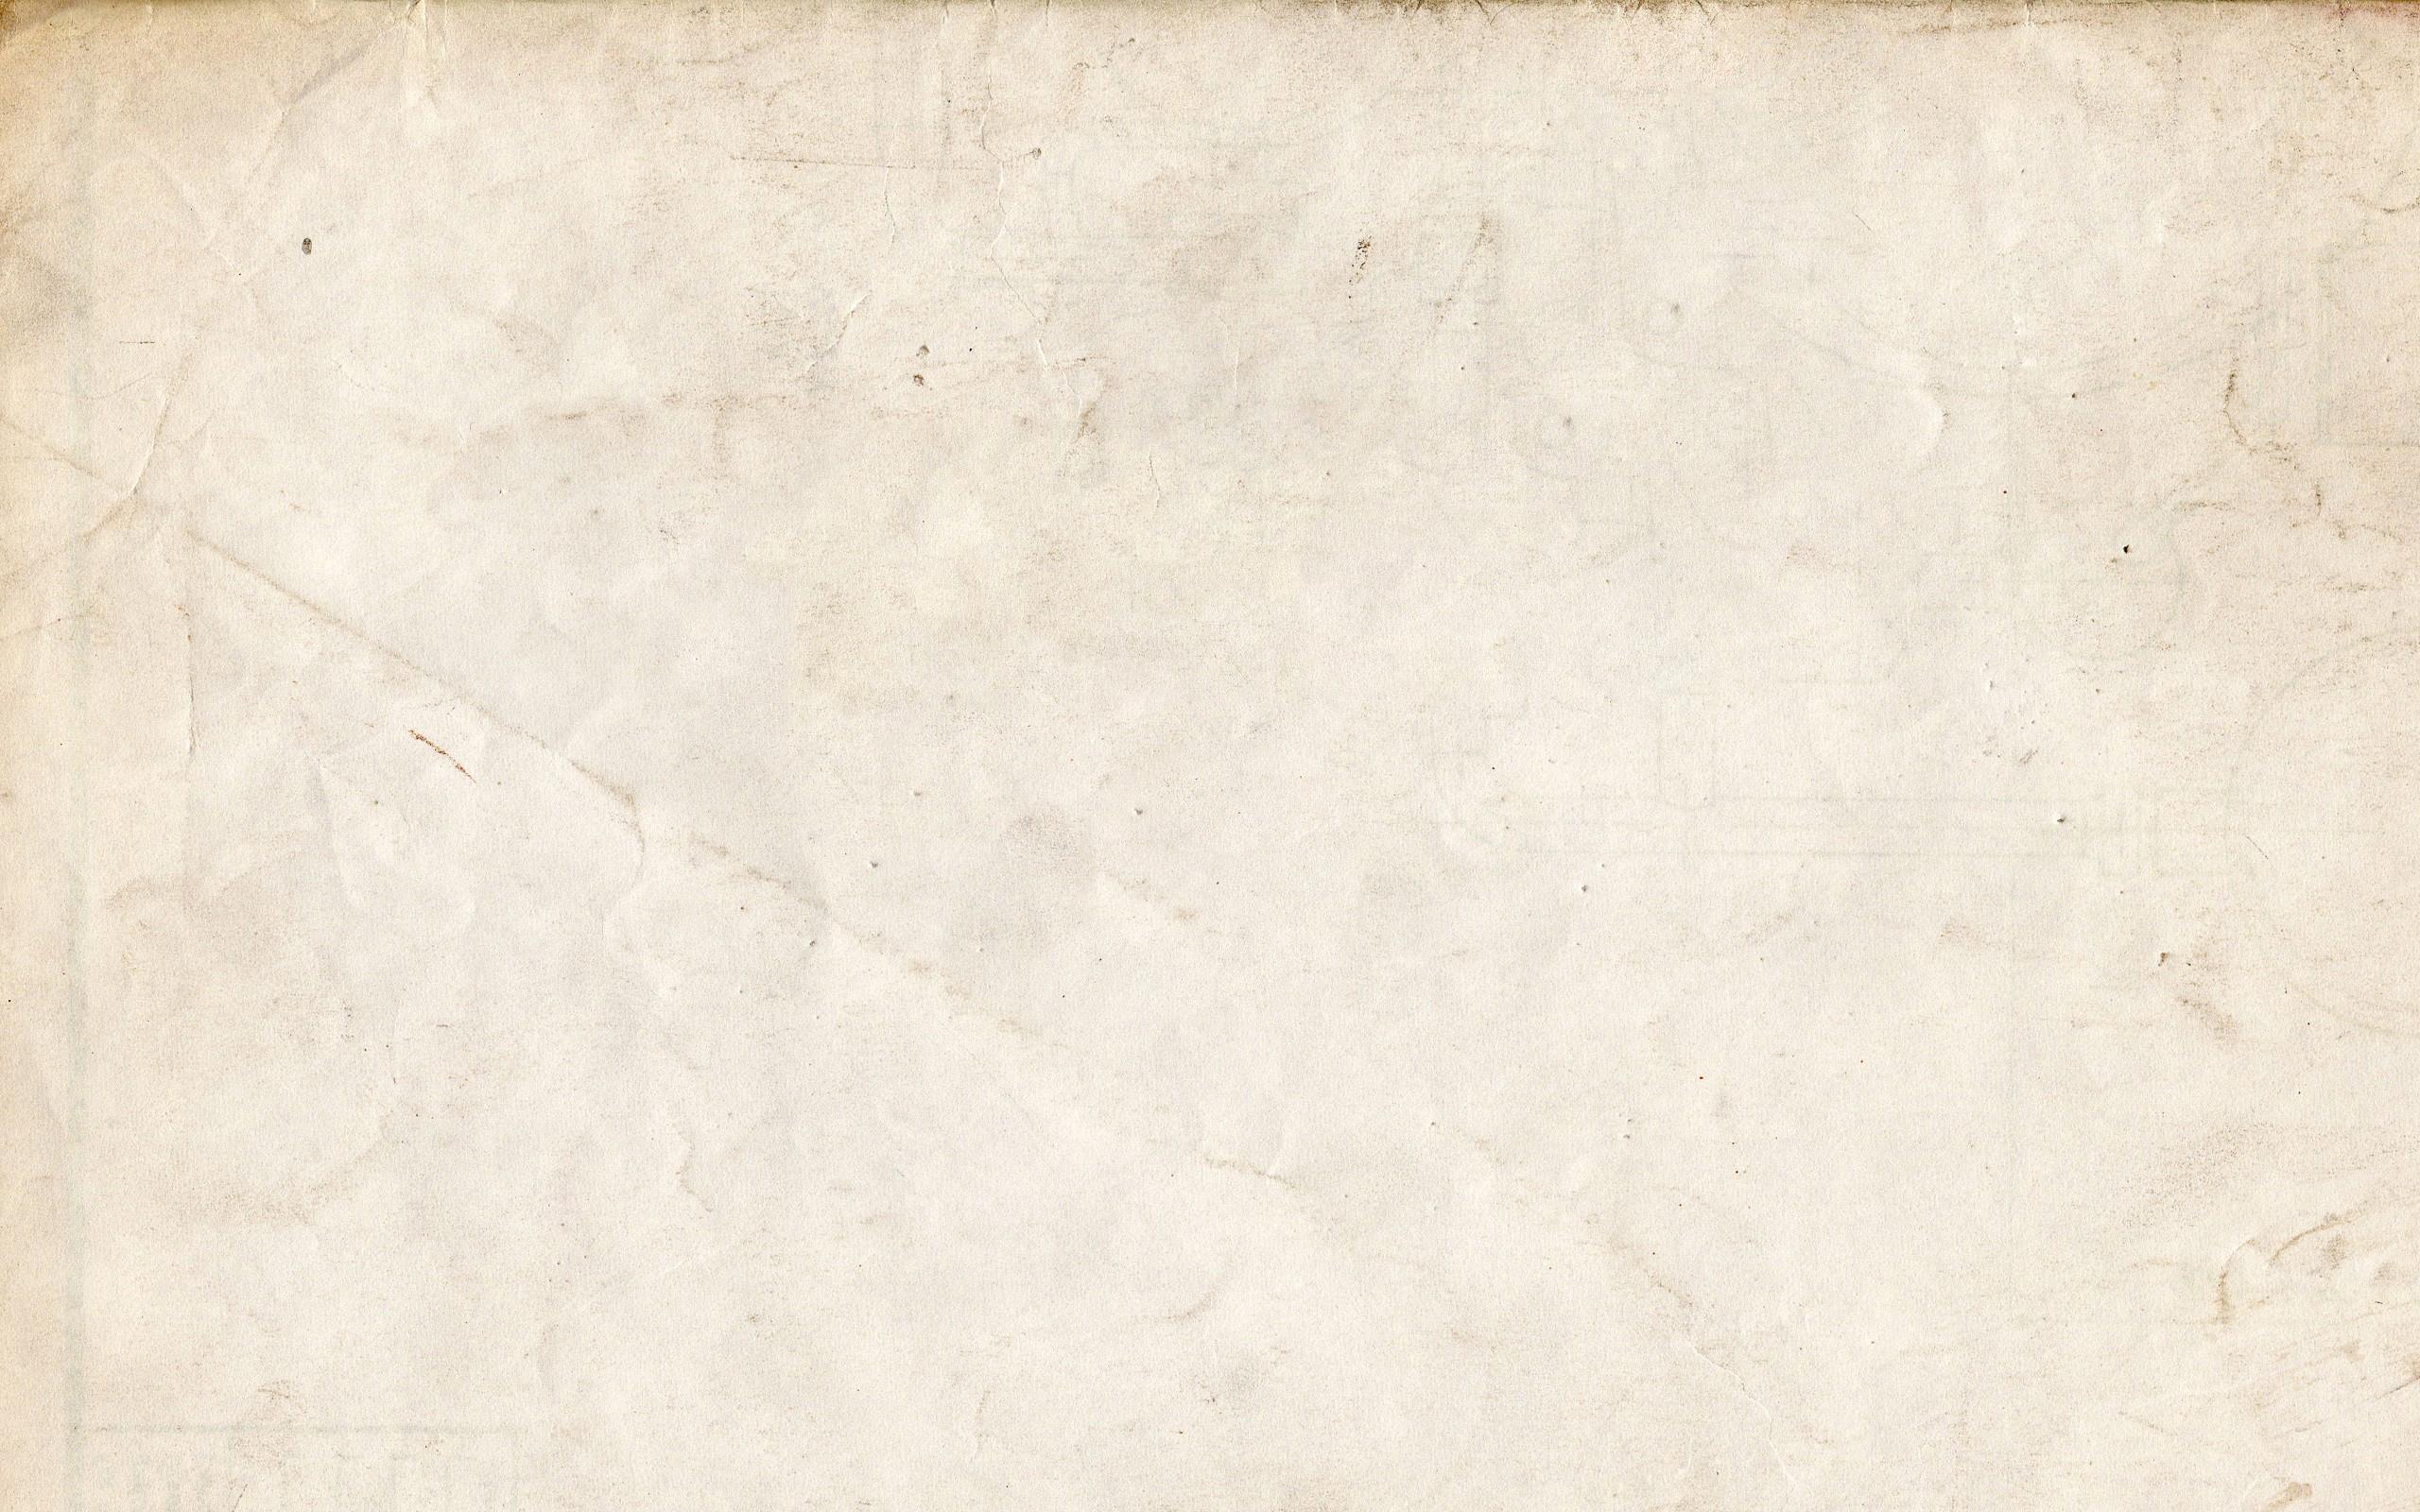 Blanco Full HD Fondo De Pantalla And Fondo De Escritorio